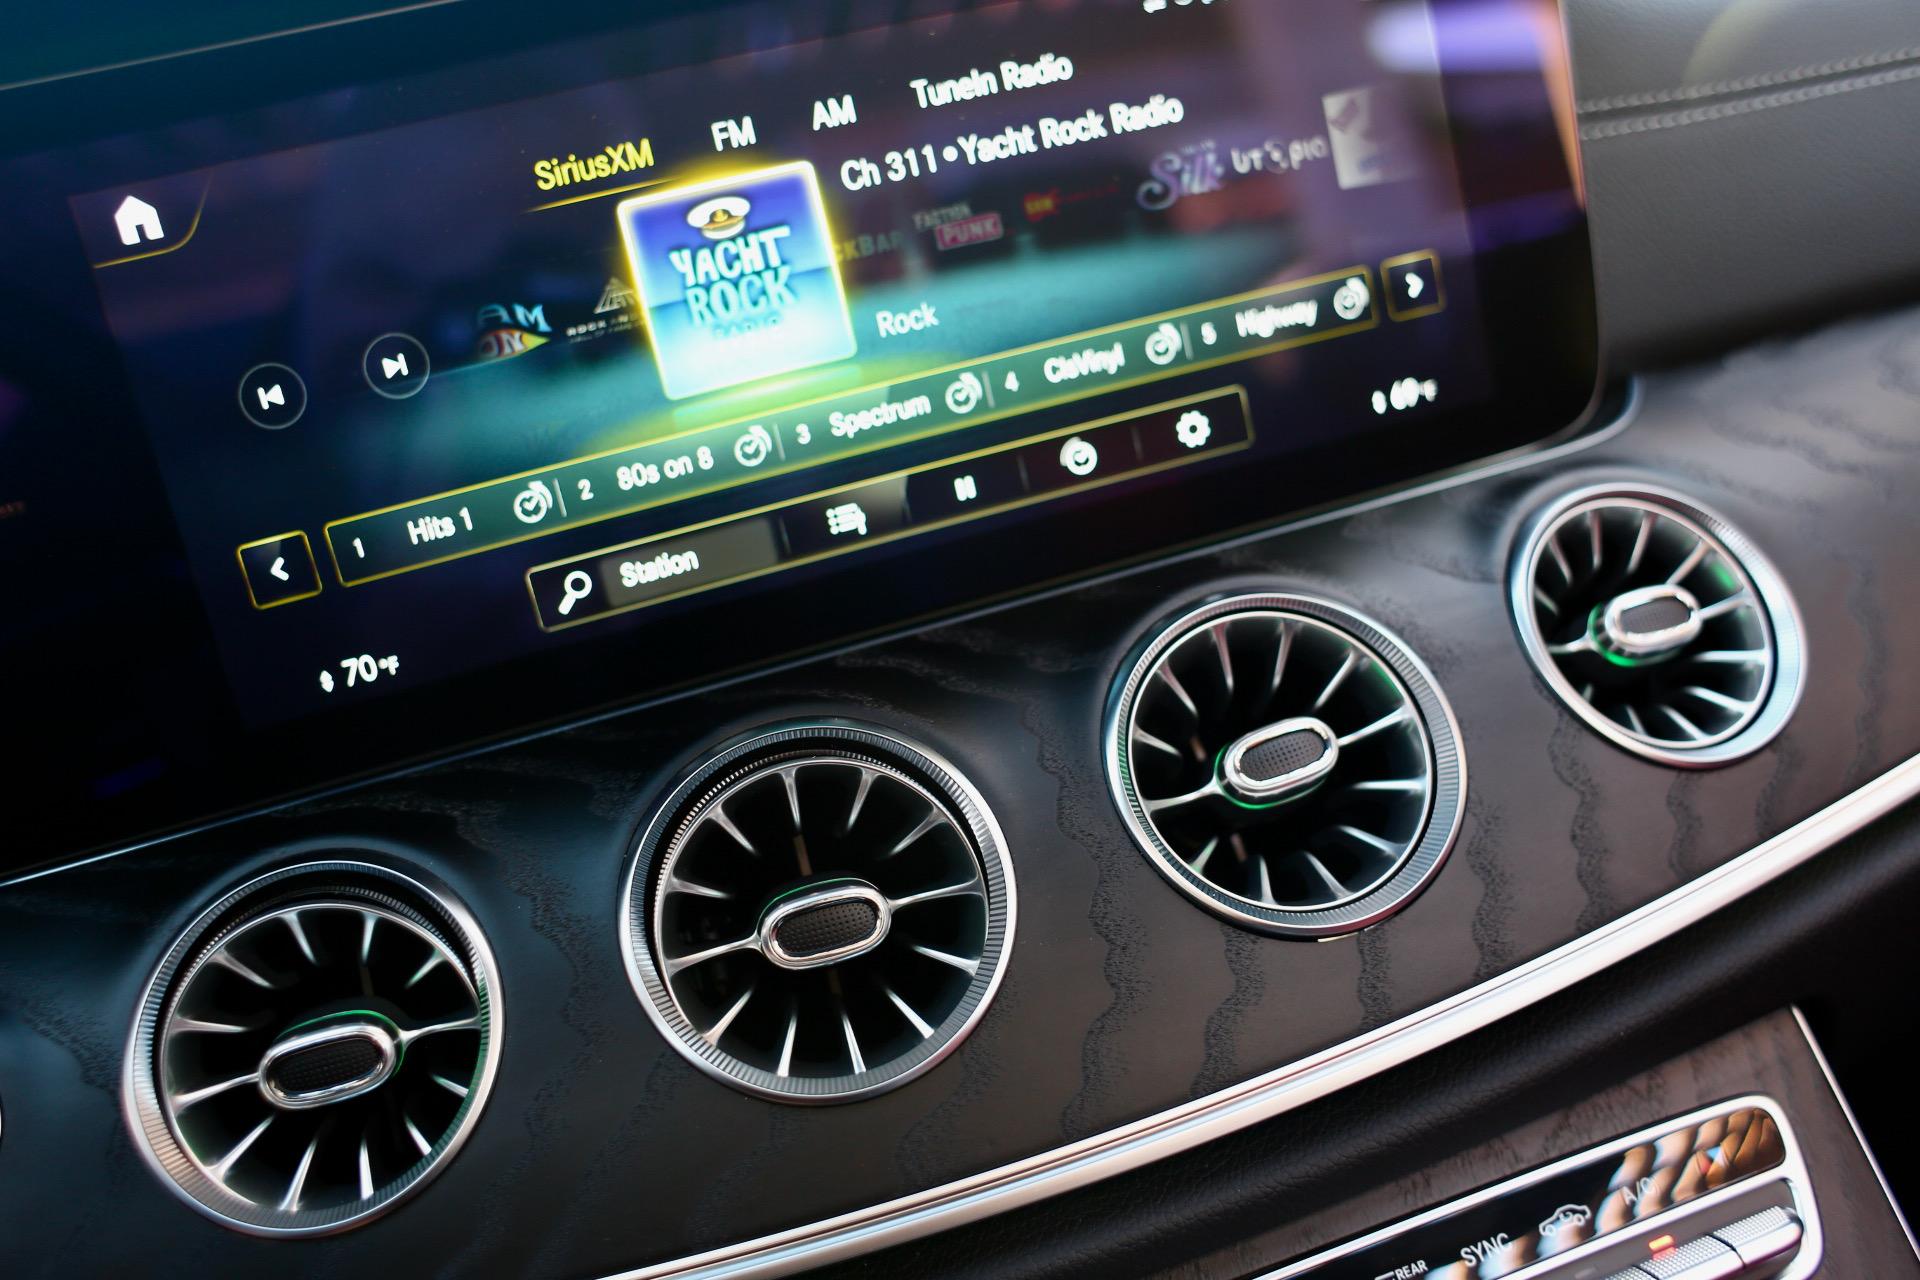 Mercedes-Benz E-Class Cabriolet 2021 (E450 4Matic)